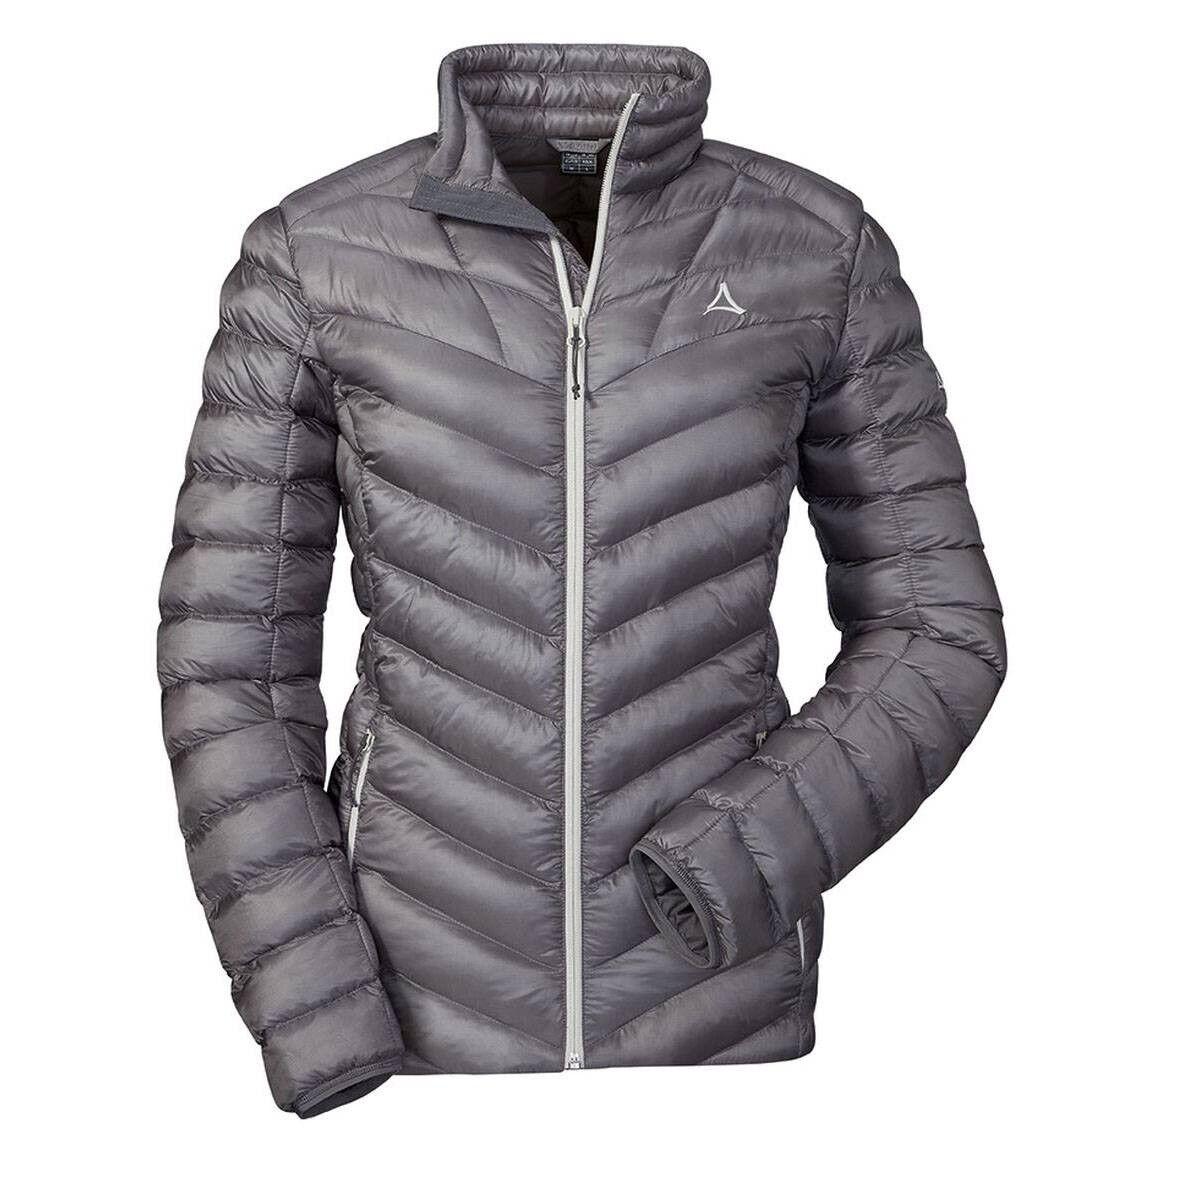 Schöffel Thermo Jacket Annapolis Damen Steppjacke silber silber silber cc543b